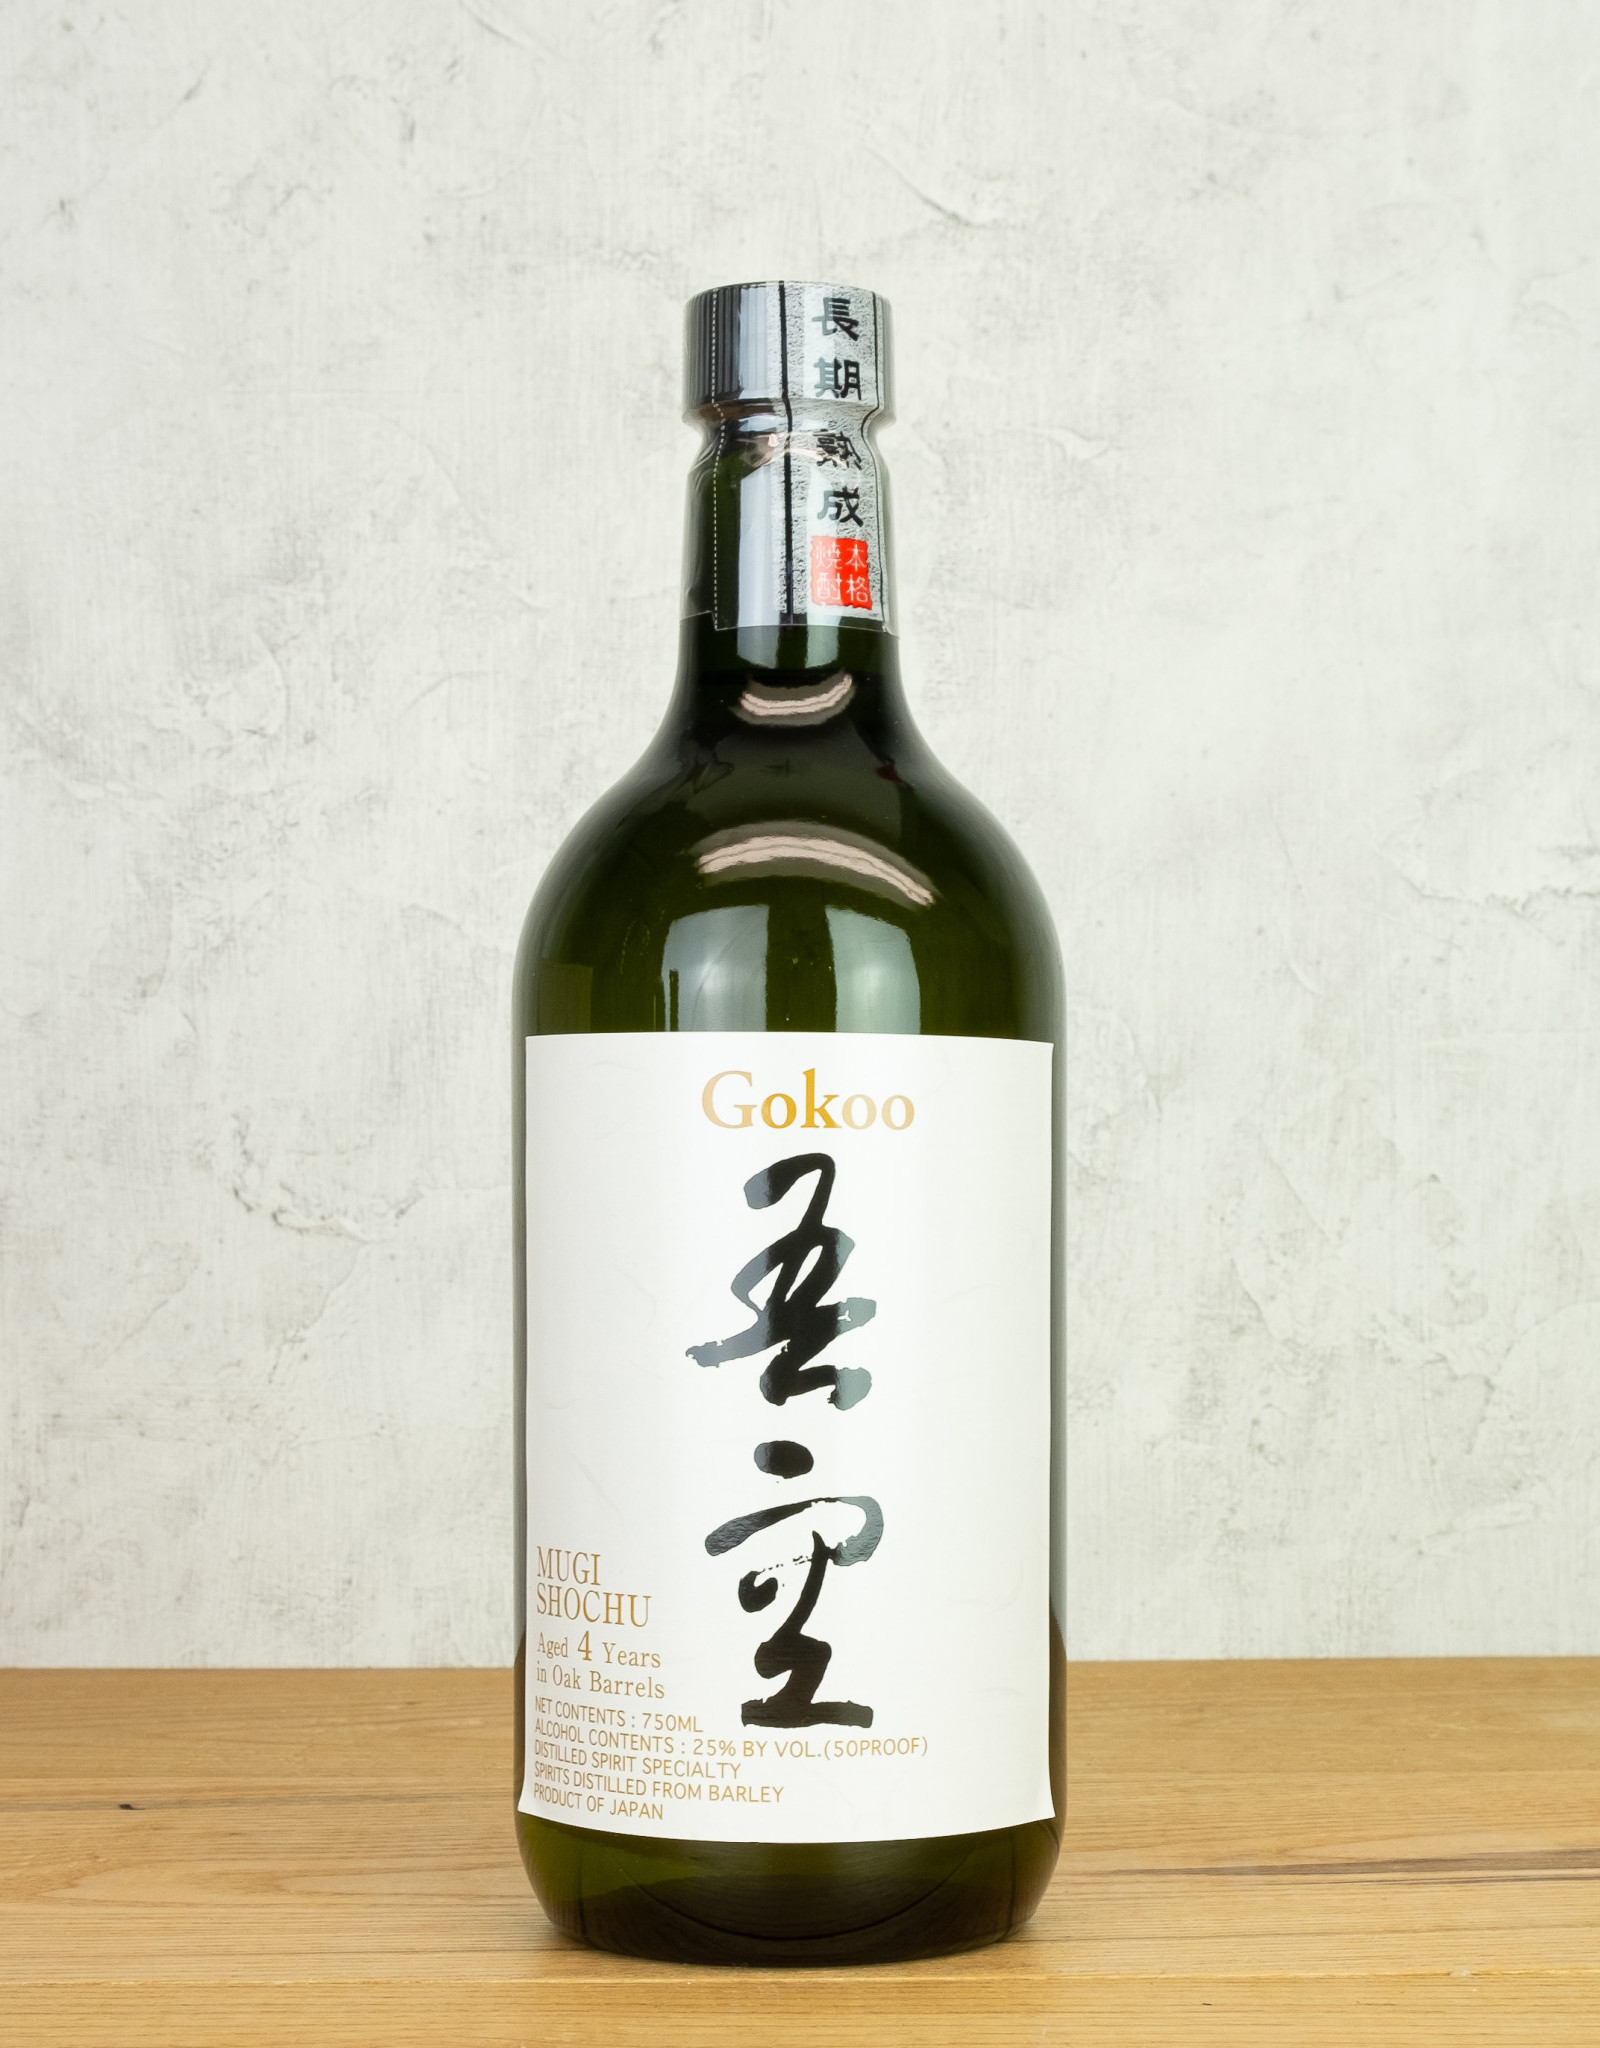 Gokoo Mugi Shochu